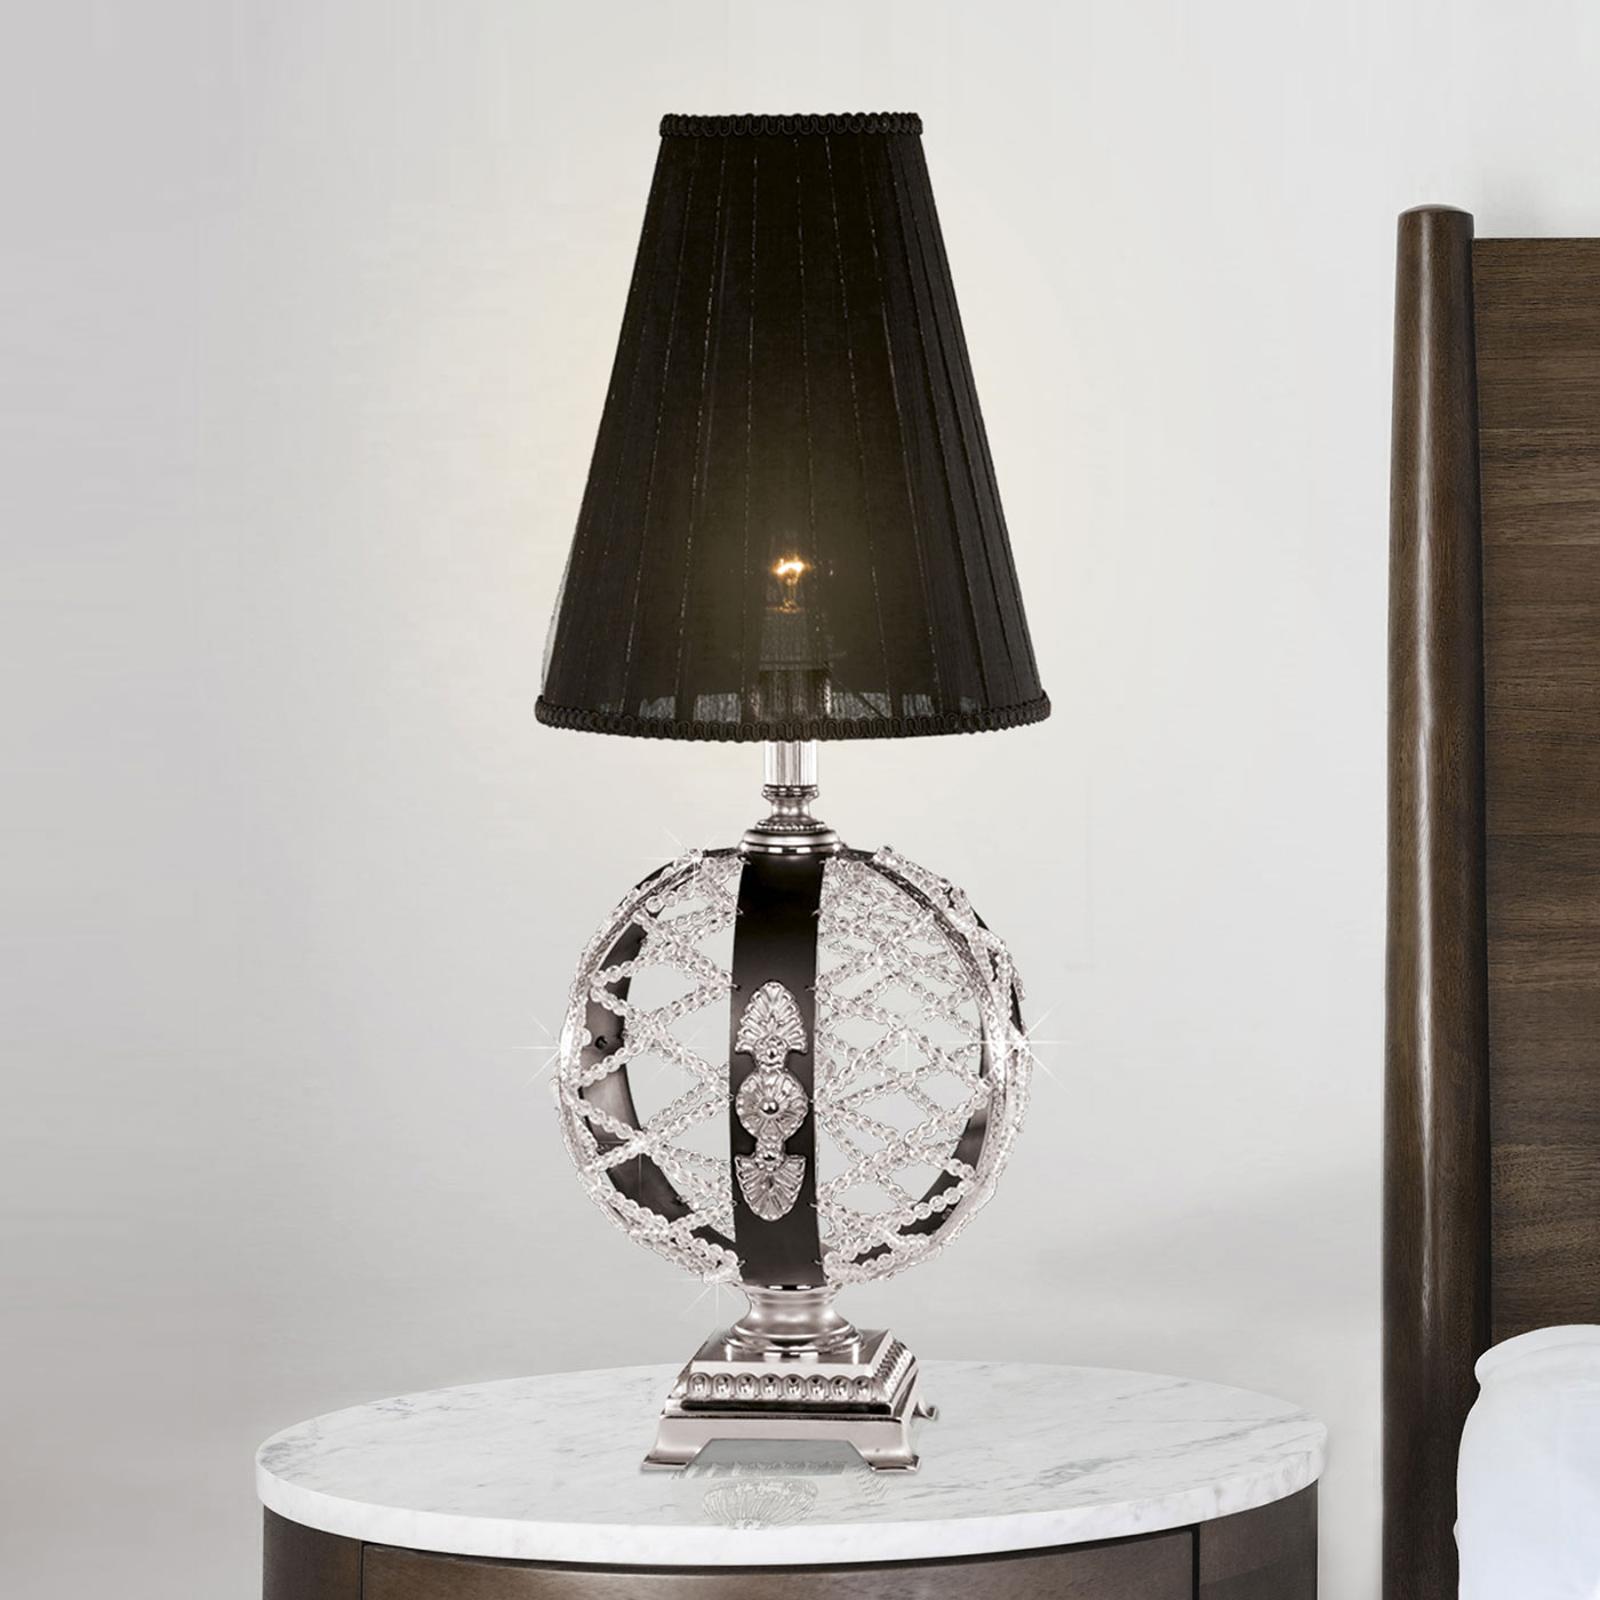 Lampe à poser Arianna, noire, nickel mat, cristal